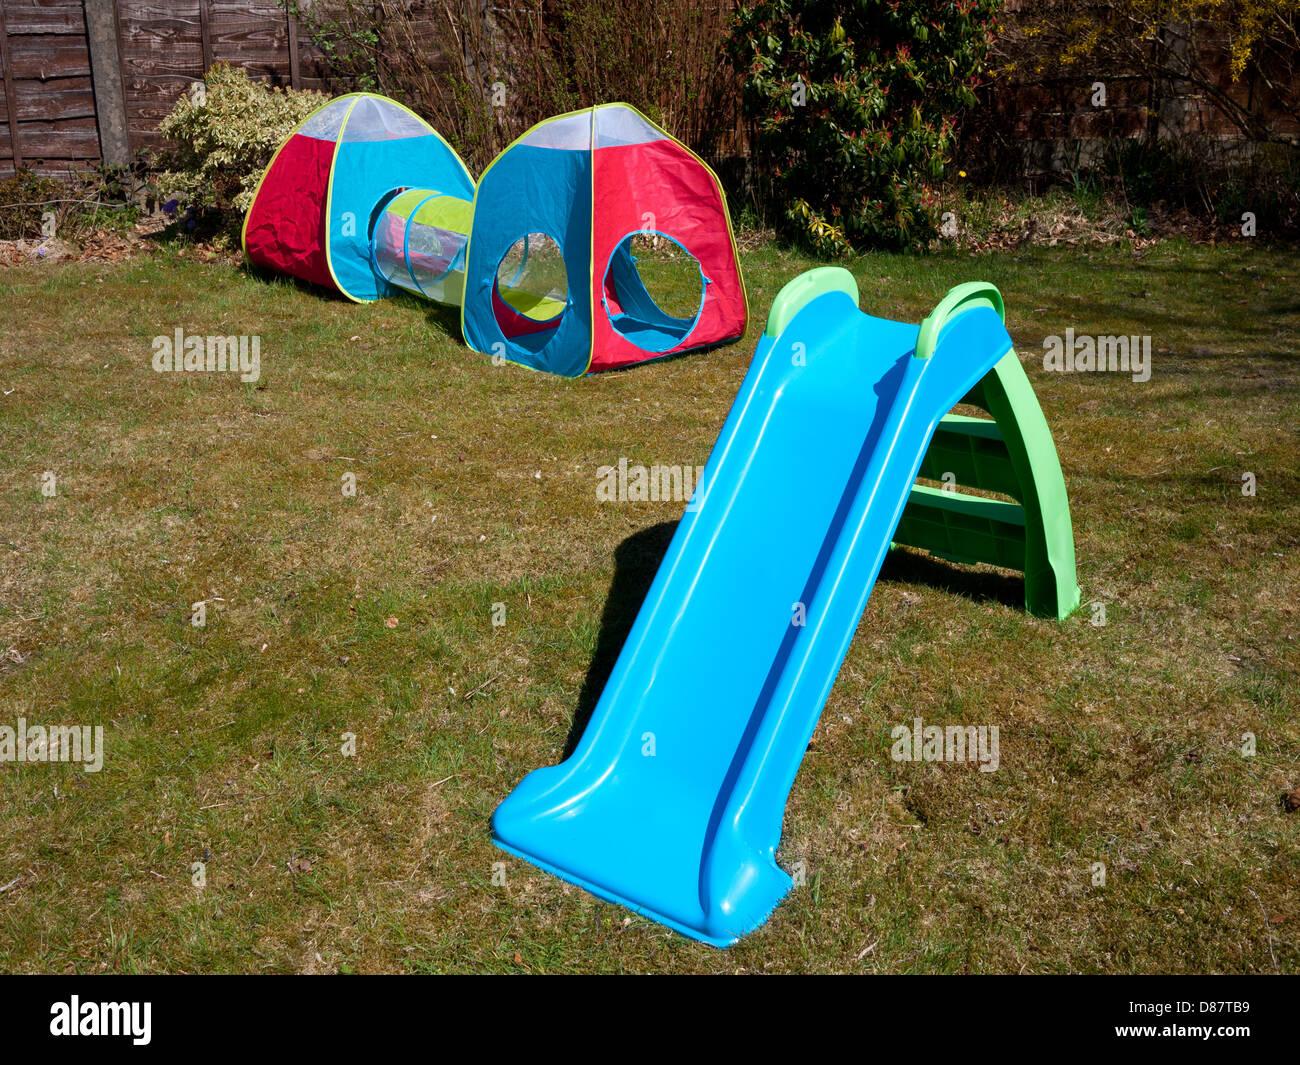 Kinder Garten Spielzeug Stockfoto Bild 56721149 Alamy